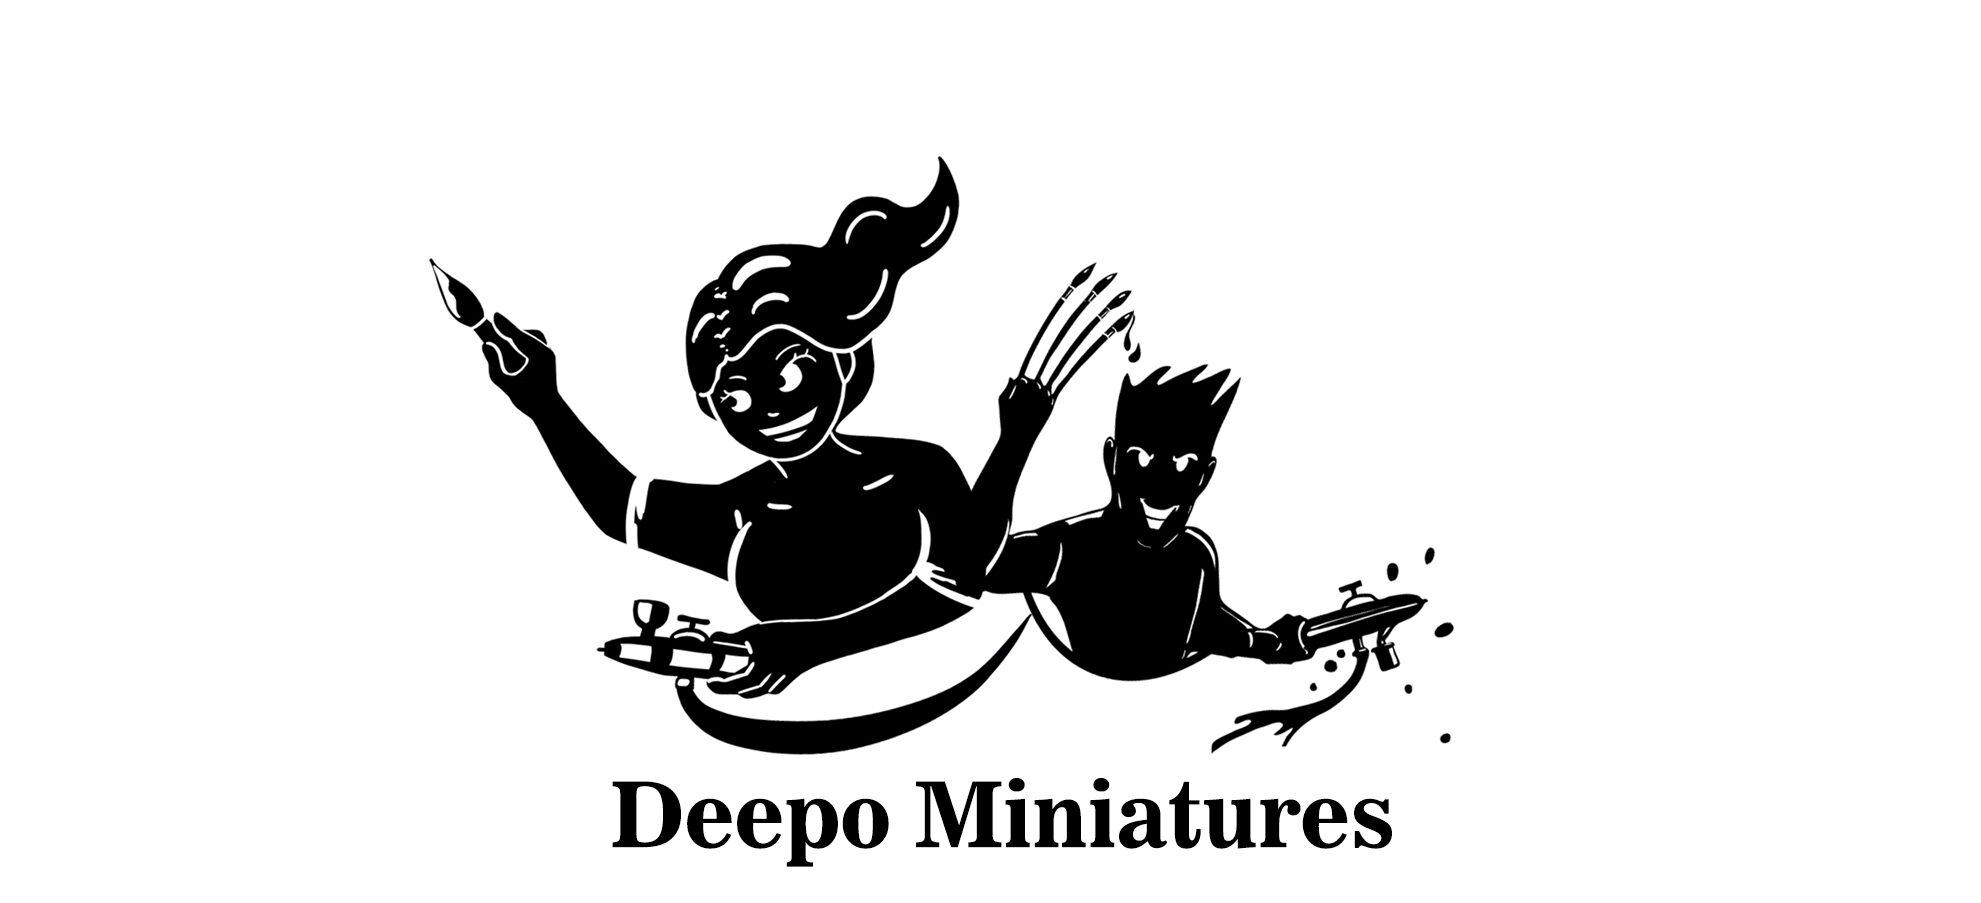 Deepo Miniatures